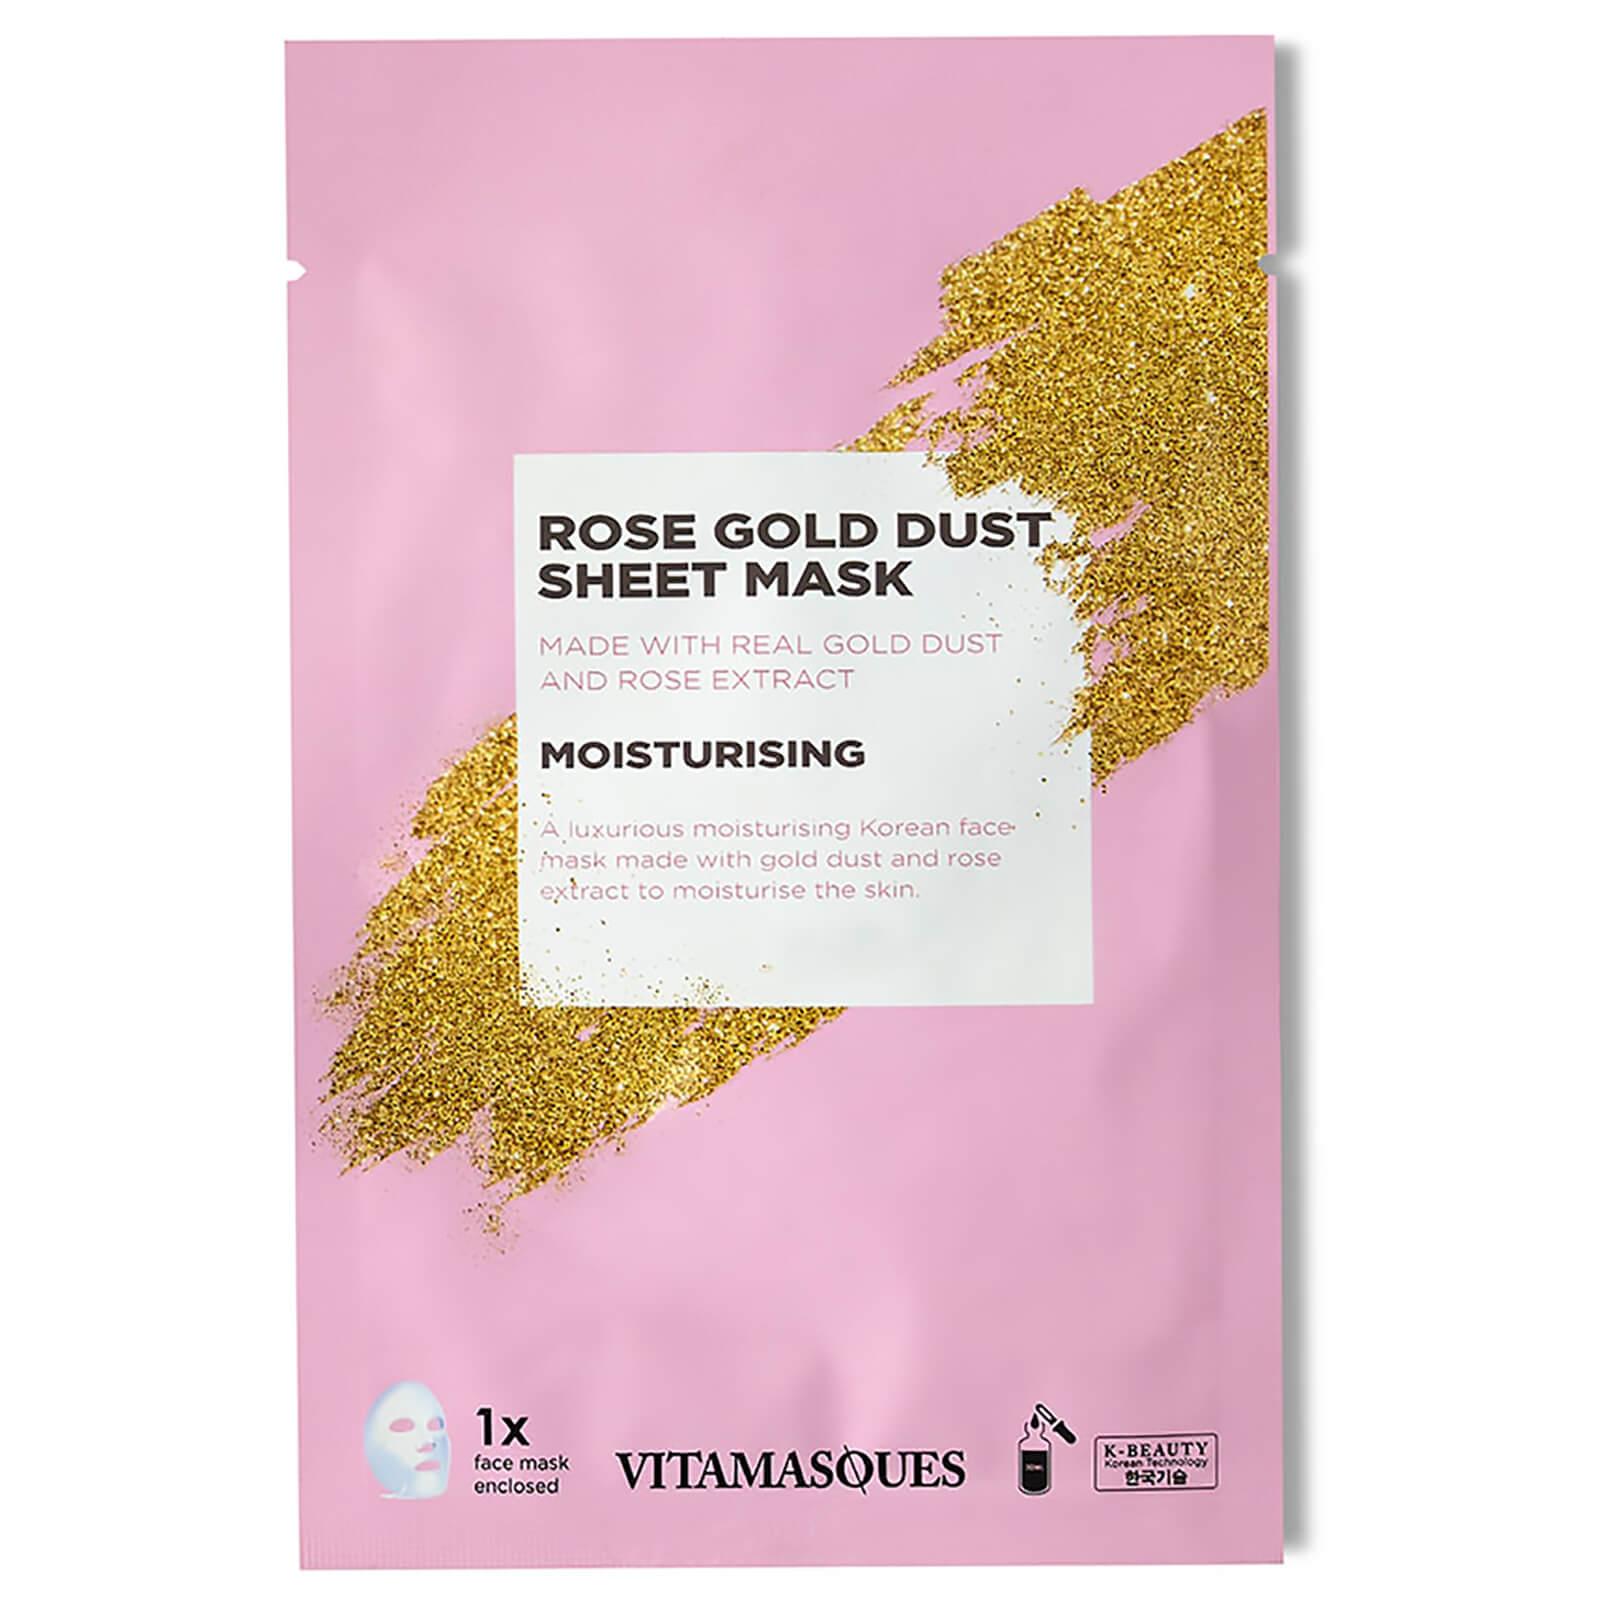 Vitamasques Gold Dust Sheet Mask - Rose